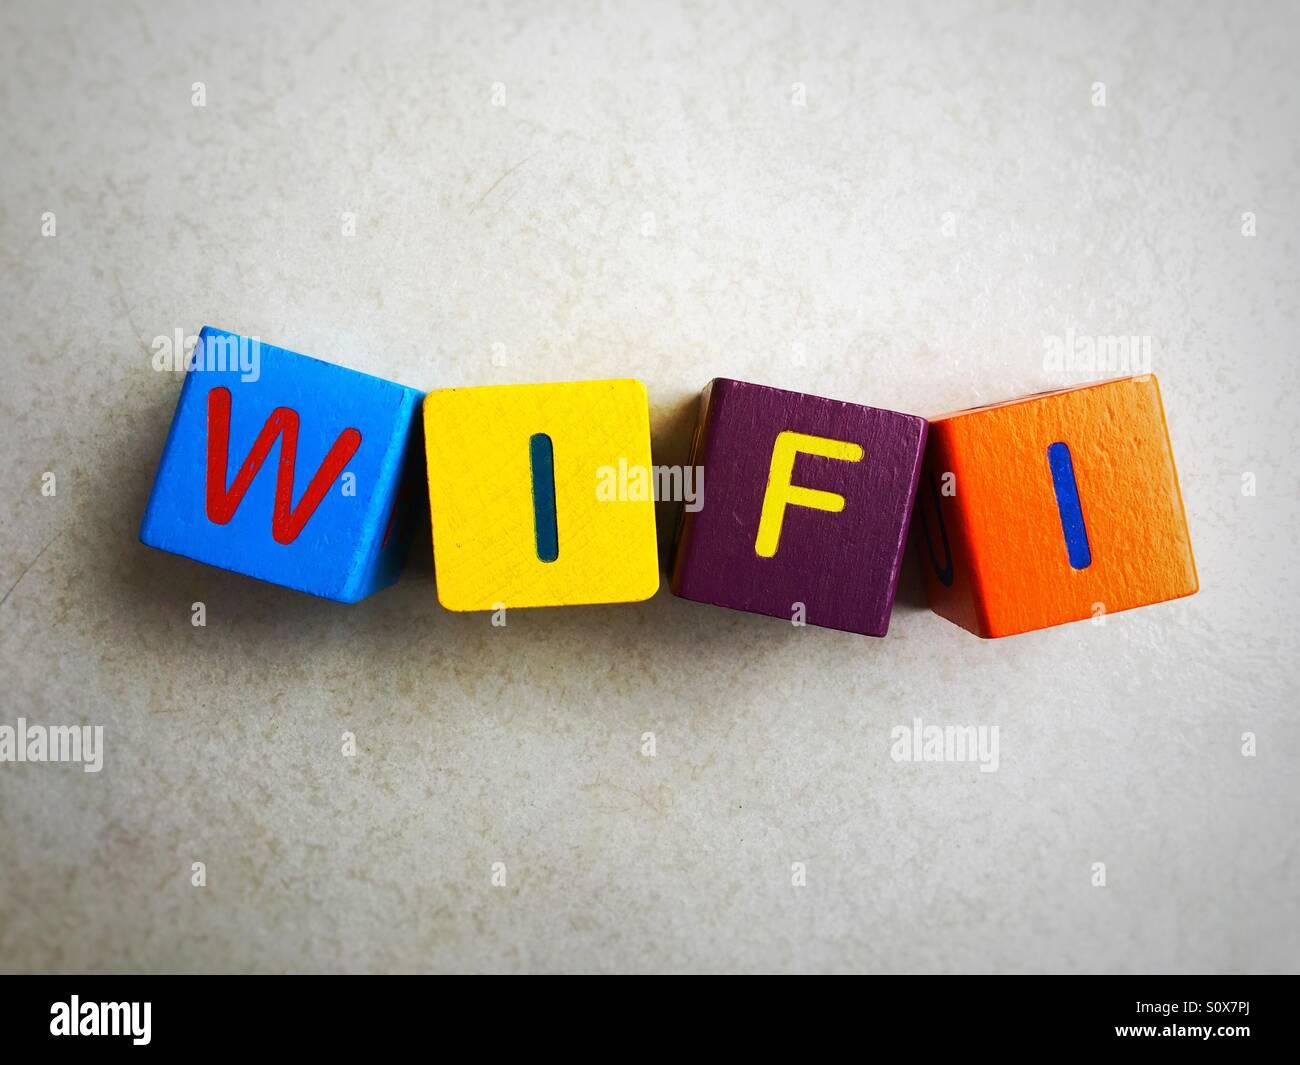 Wi-Fi Imagen De Stock